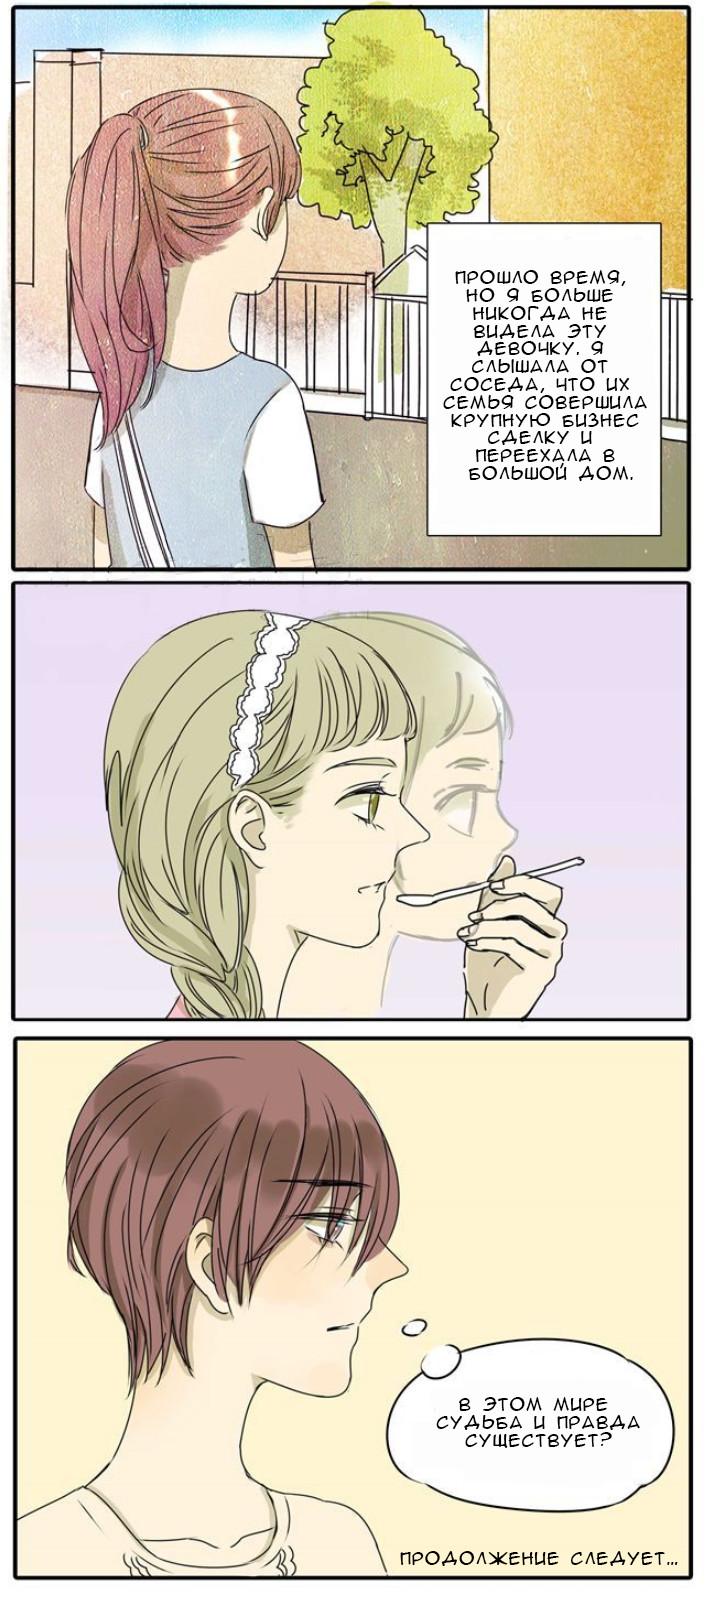 https://r1.ninemanga.com/comics/pic2/20/30804/310697/1475726718104.jpg Page 9